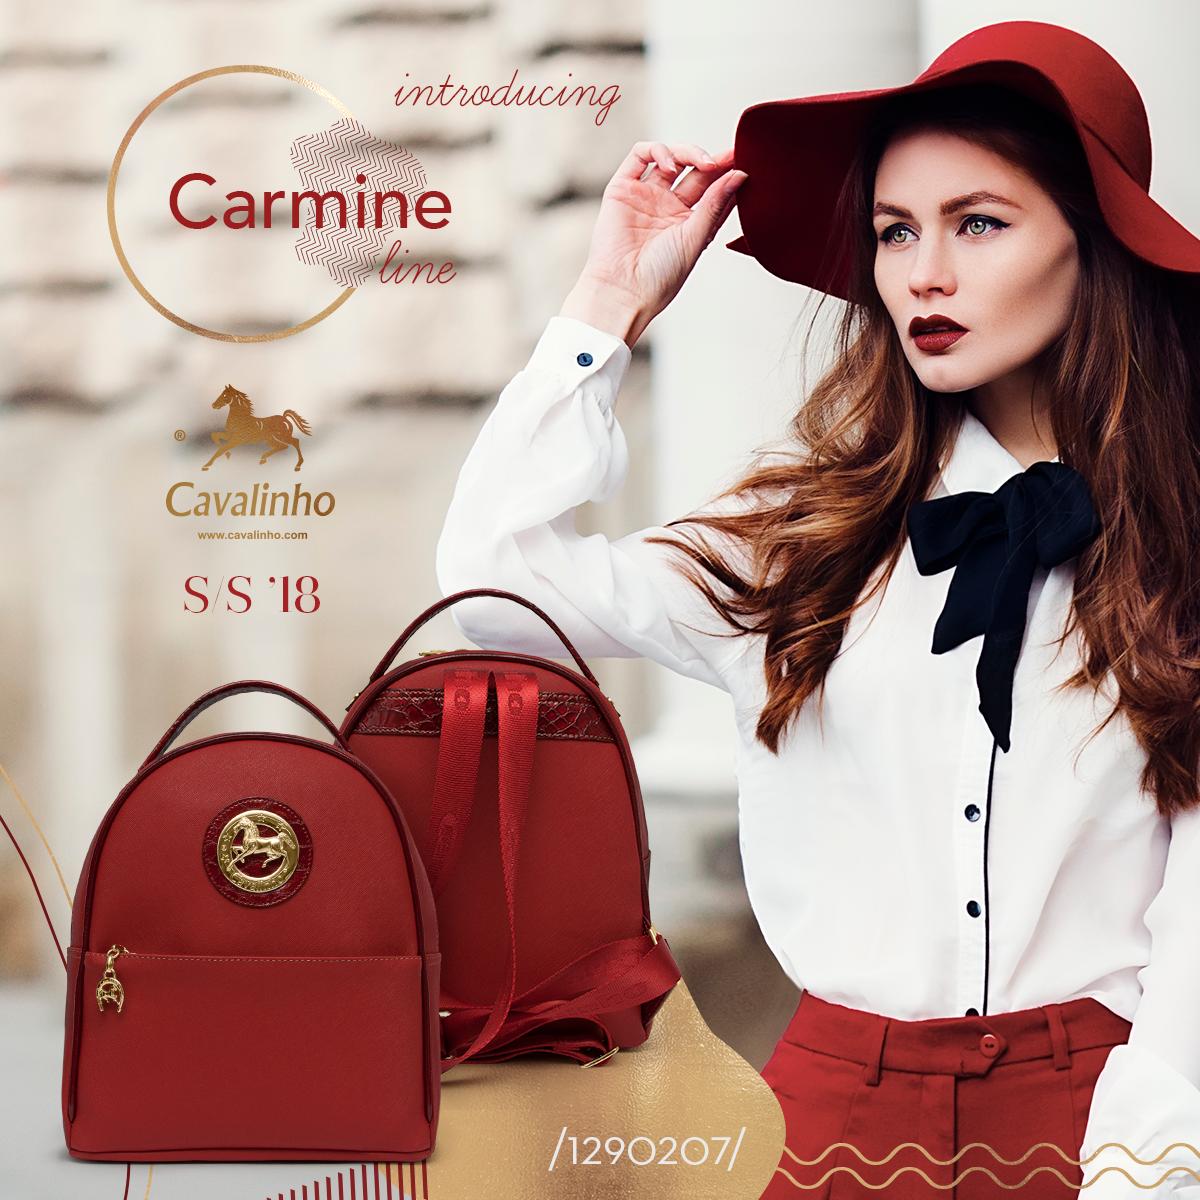 Carmine_post1